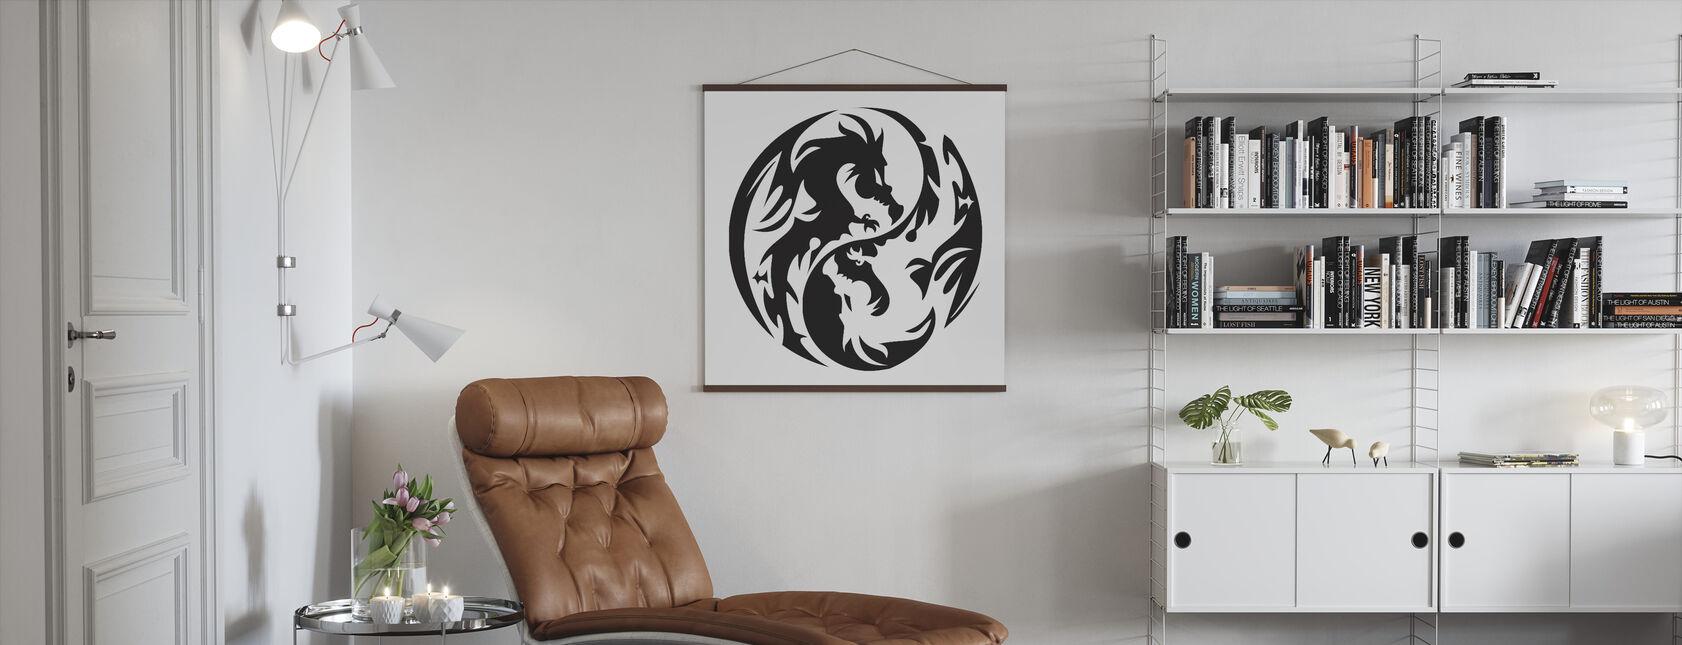 Ympyrä lohikäärmeet - Juliste - Olohuone